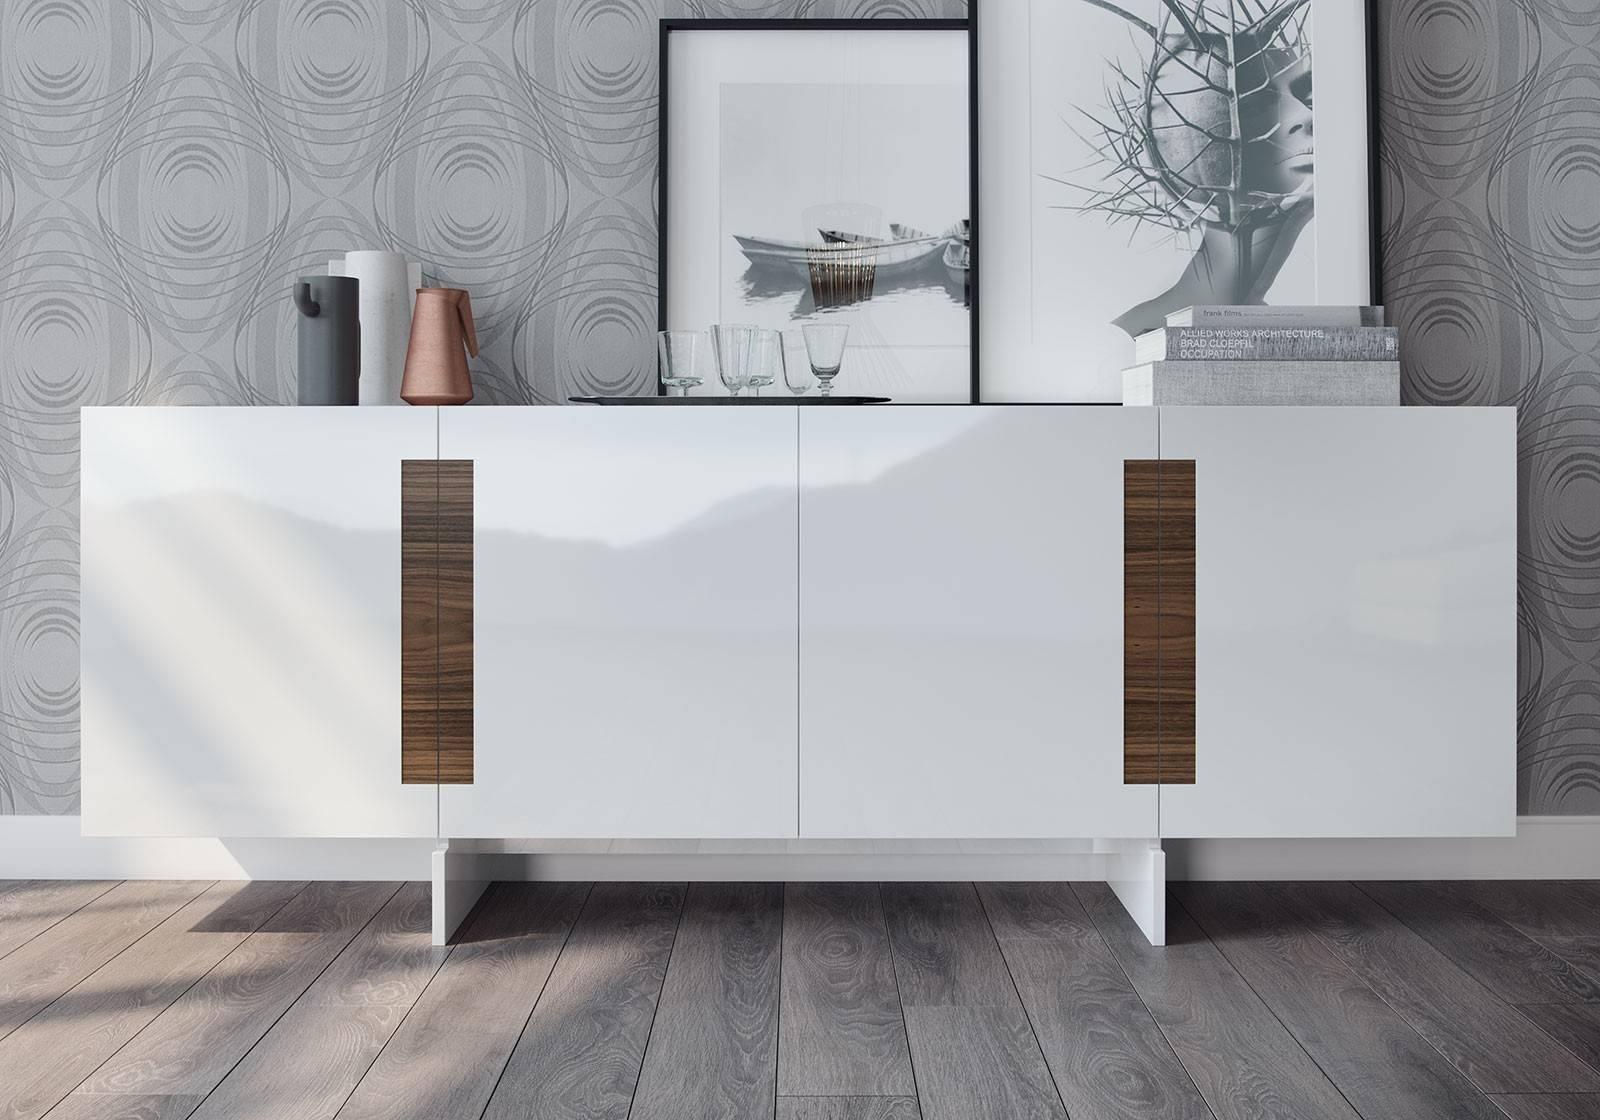 Brixton Sideboardmodloft | Modern Sideboards | Cressina throughout White Modern Sideboards (Image 3 of 30)